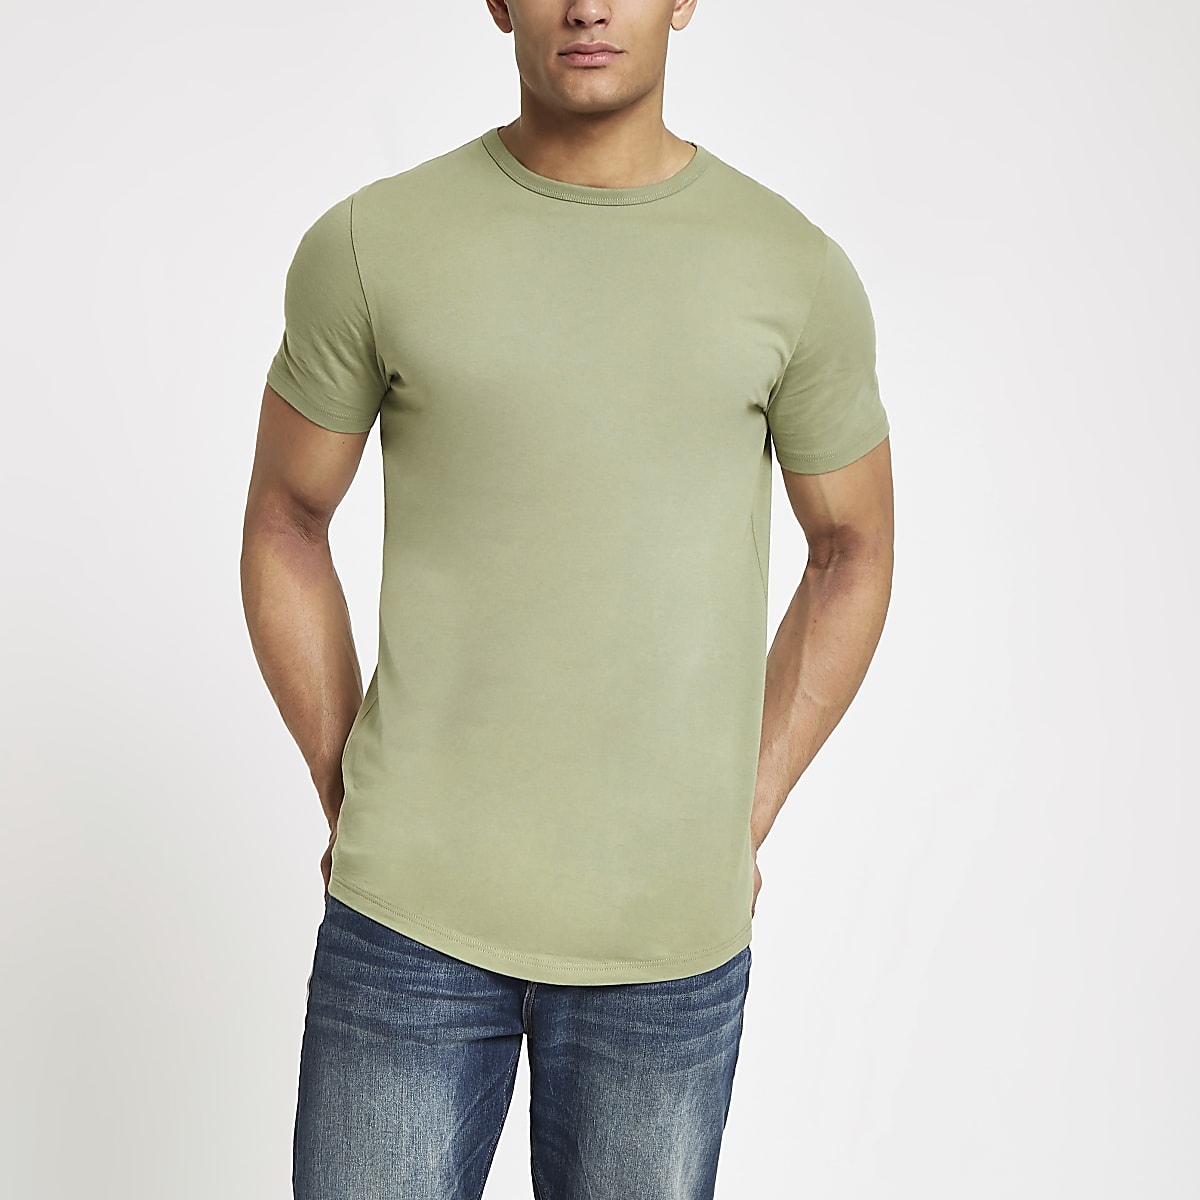 Green curved hem longline T-shirt